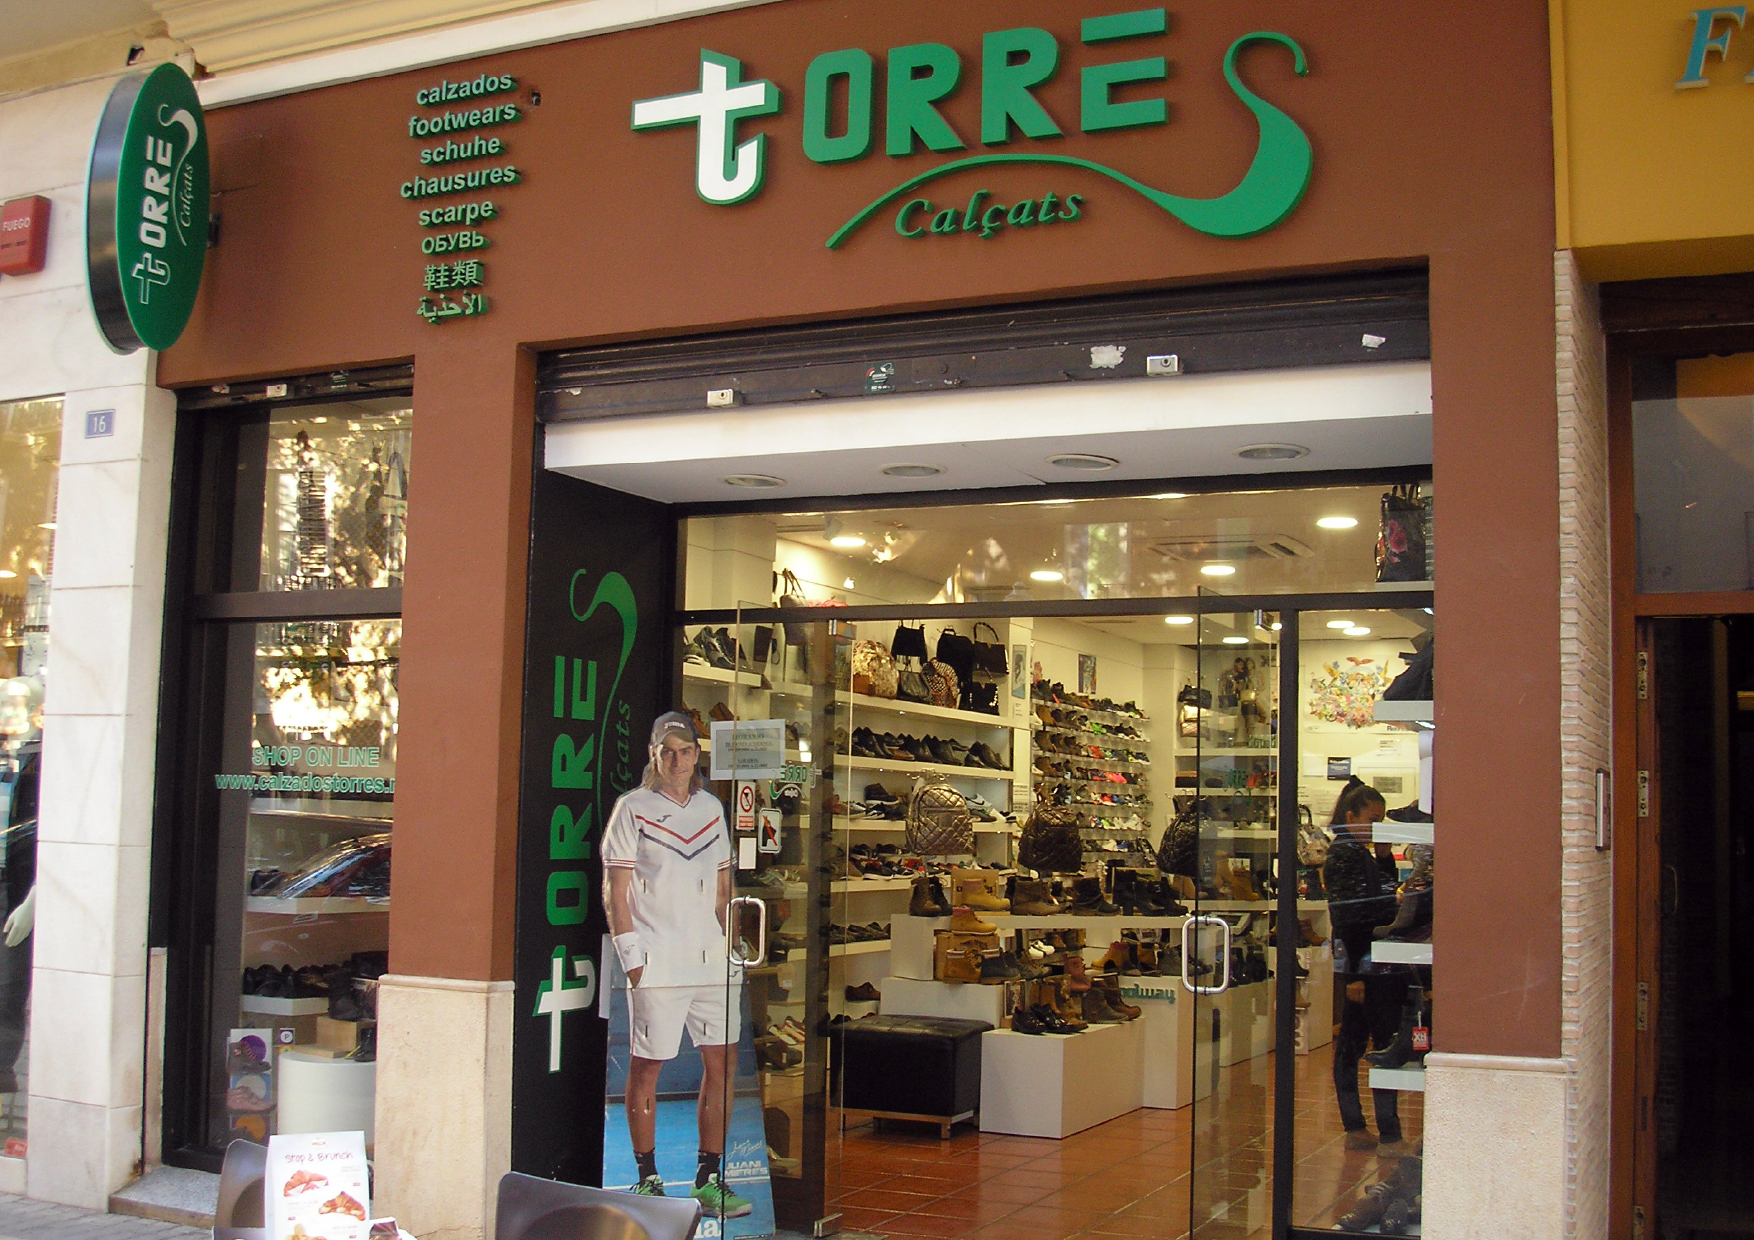 TORRES CALÇATS